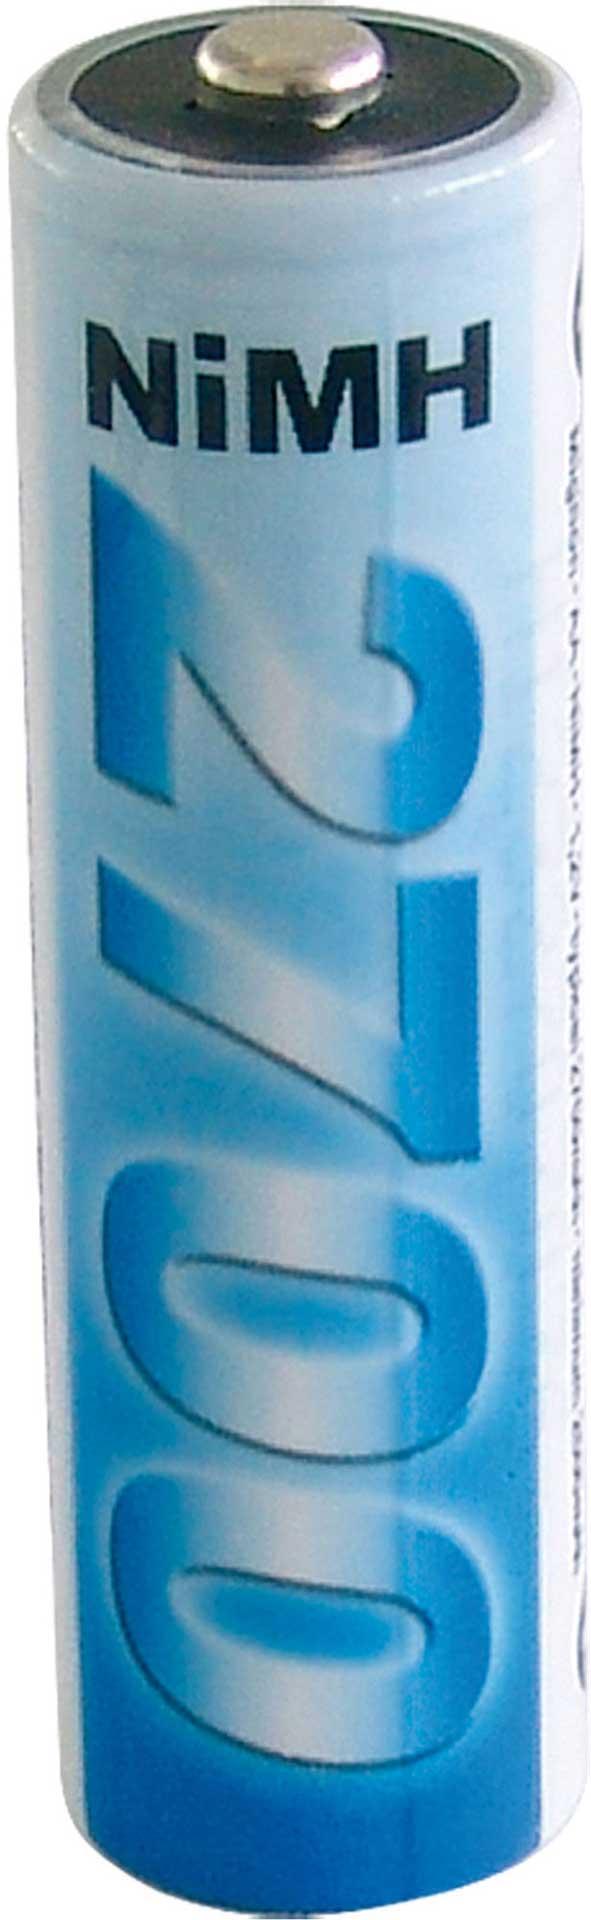 XCELL NI-MH EINZELZELLE 1,2 VOLT 2700 MAH